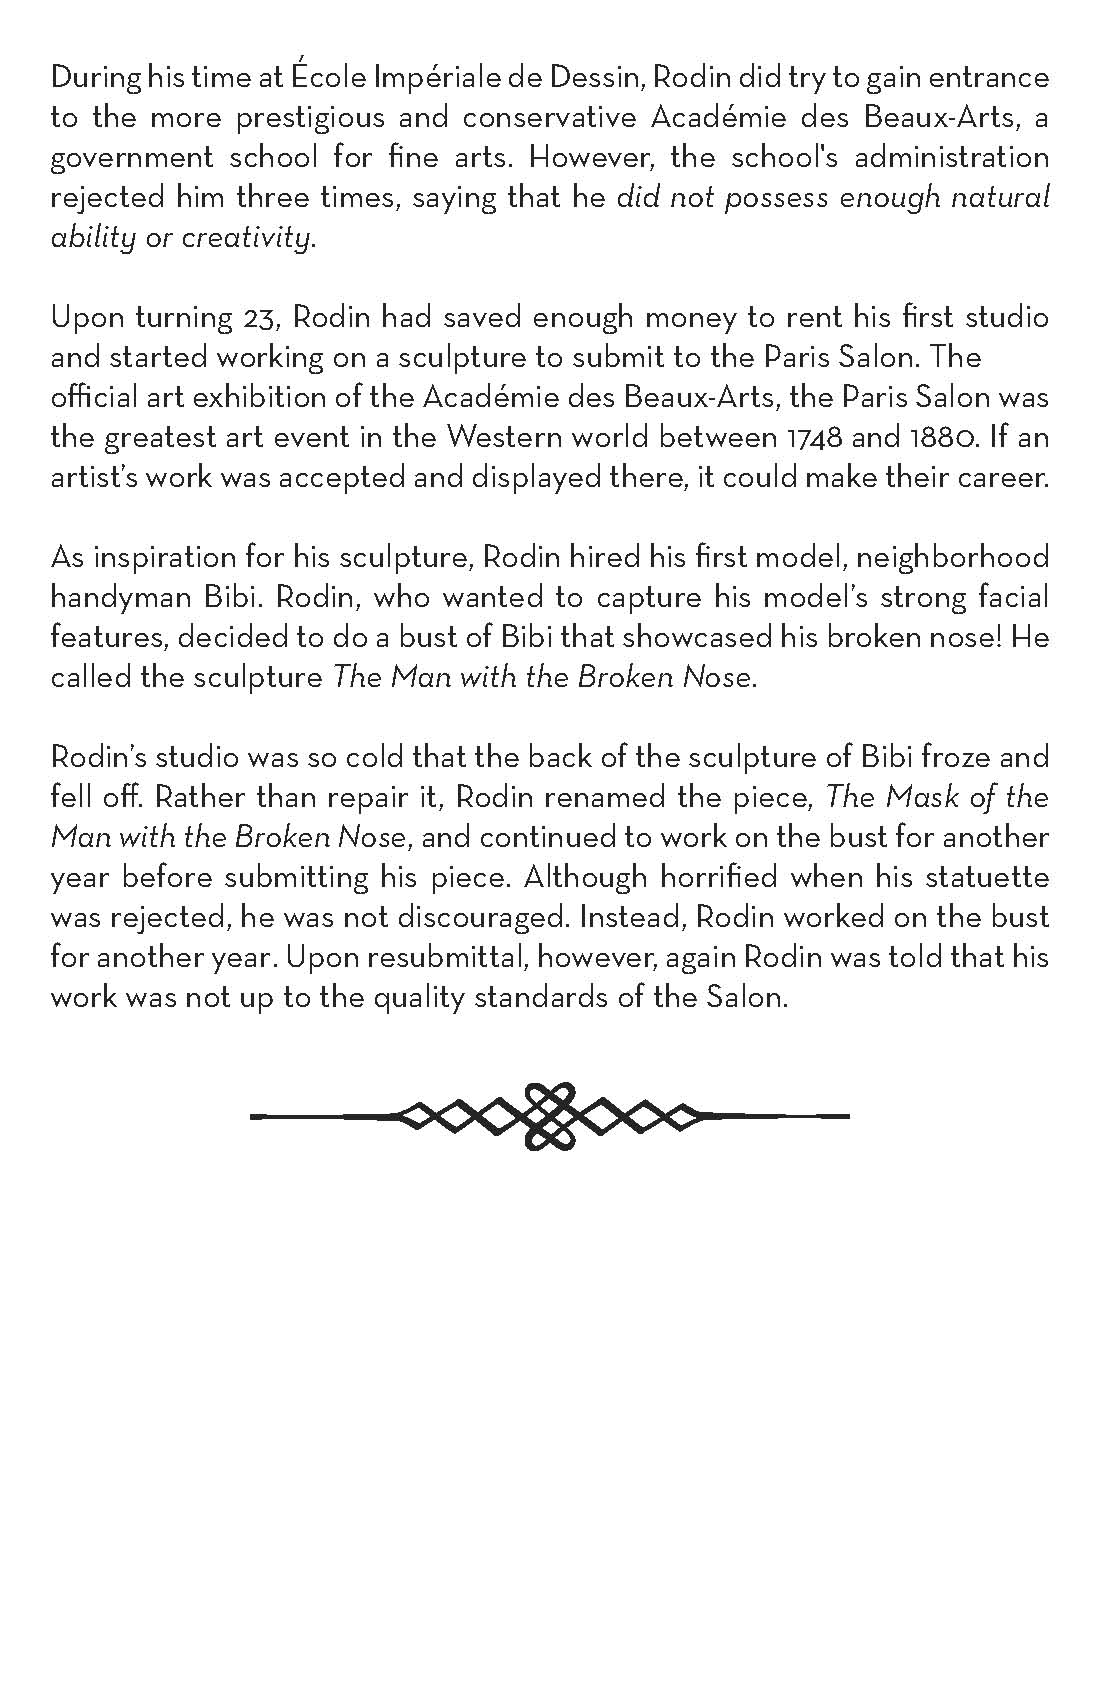 Rodin Booklet Final_Page_05.jpg